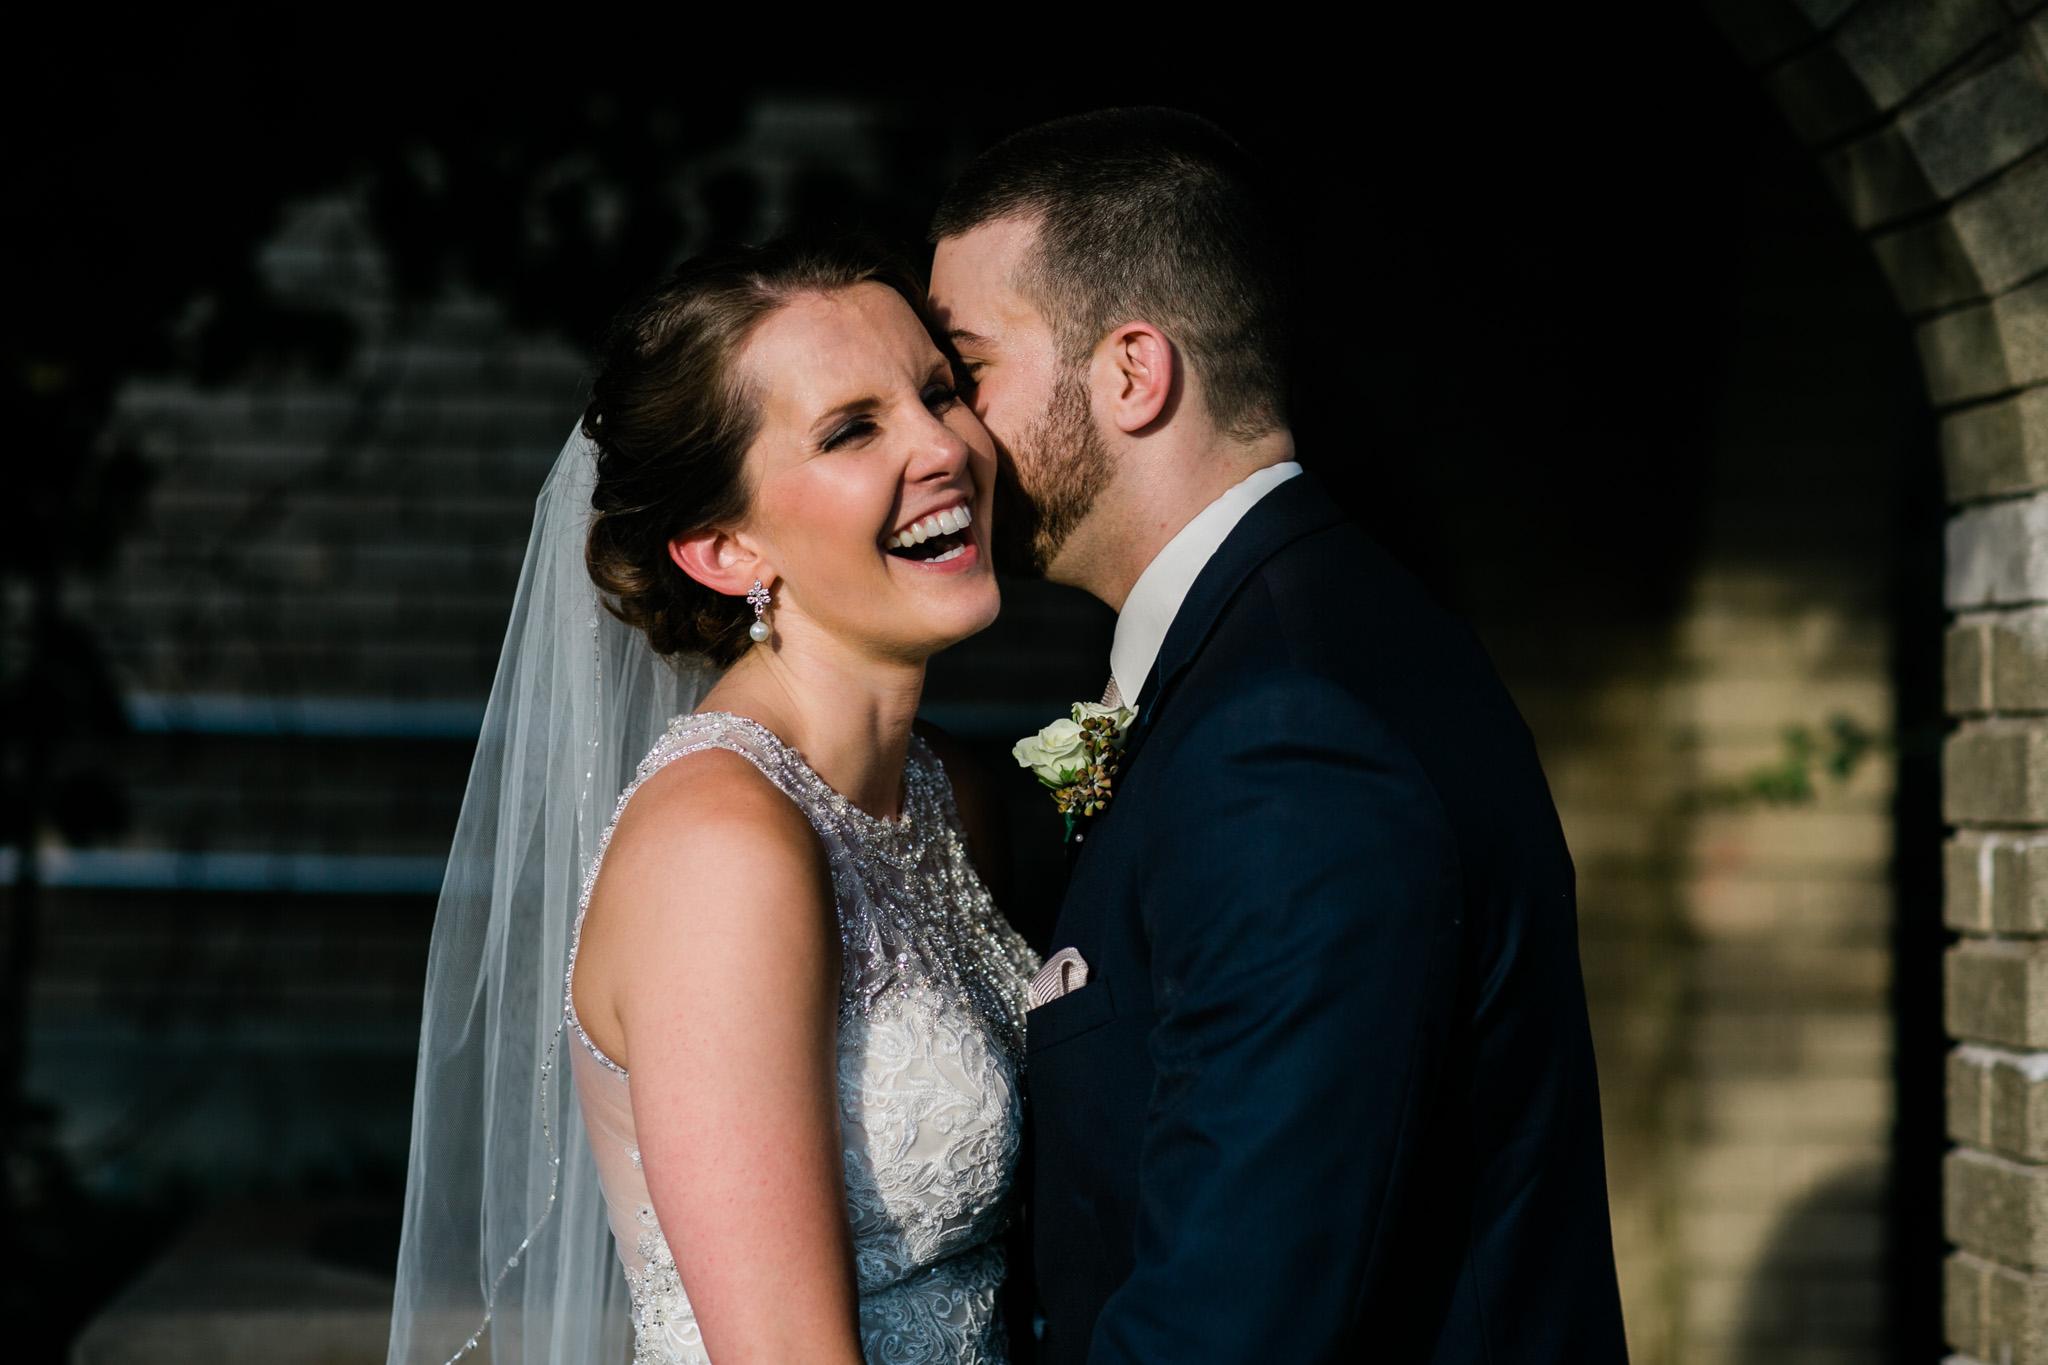 West Virginia and Virginia wedding photographer. Virginia elopement photographer, West Virginia elopement photographer, candid wedding photography, documentary wedding photography, unposed wedding photography